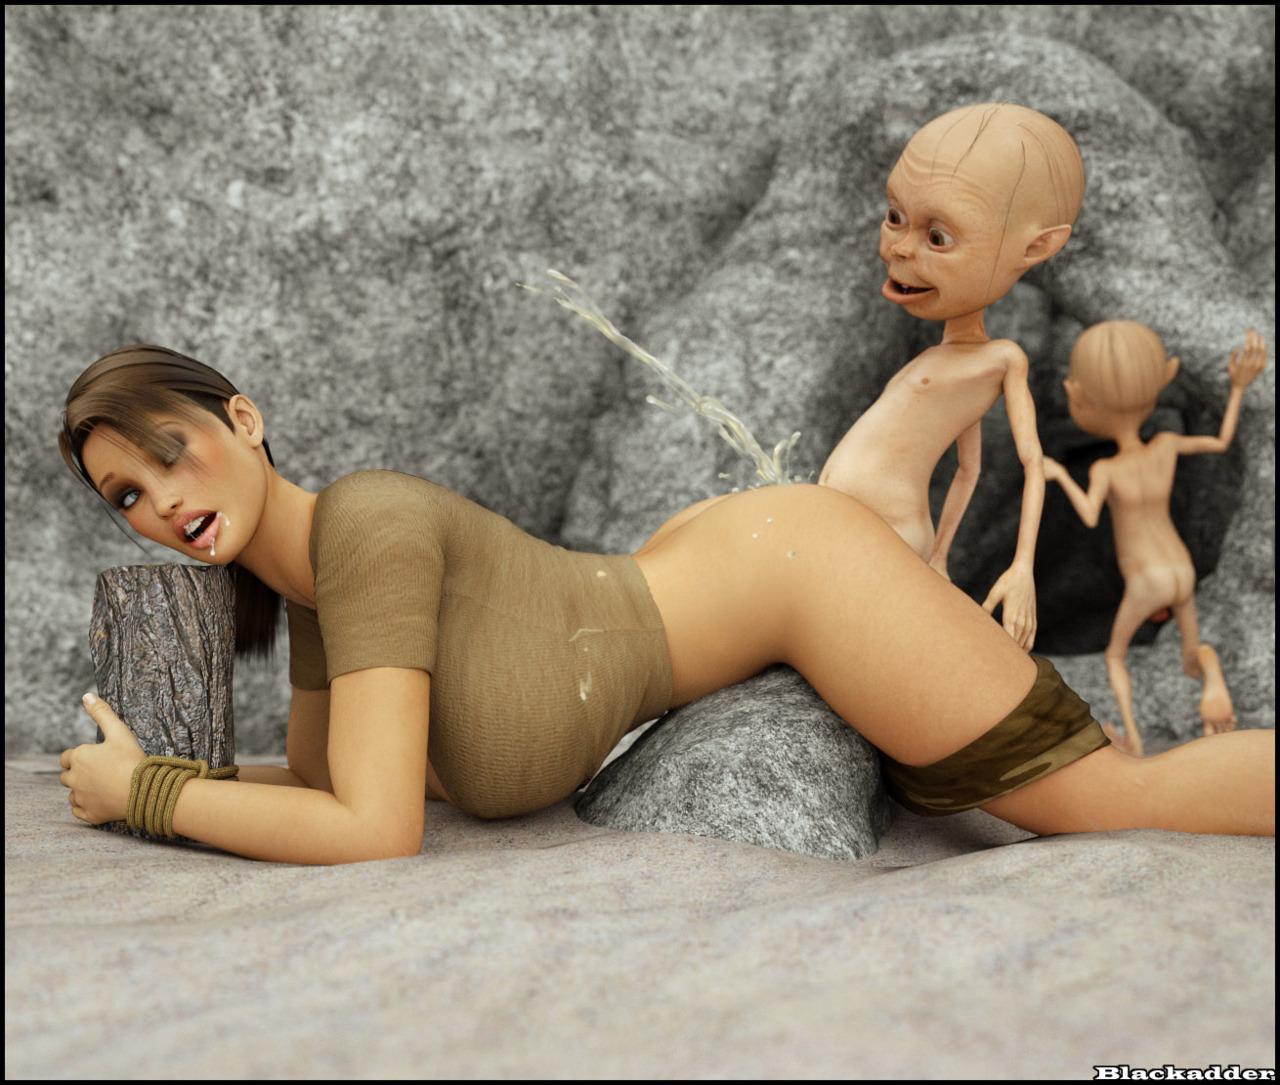 Lara Croft gobelin baise - PARTIE 2